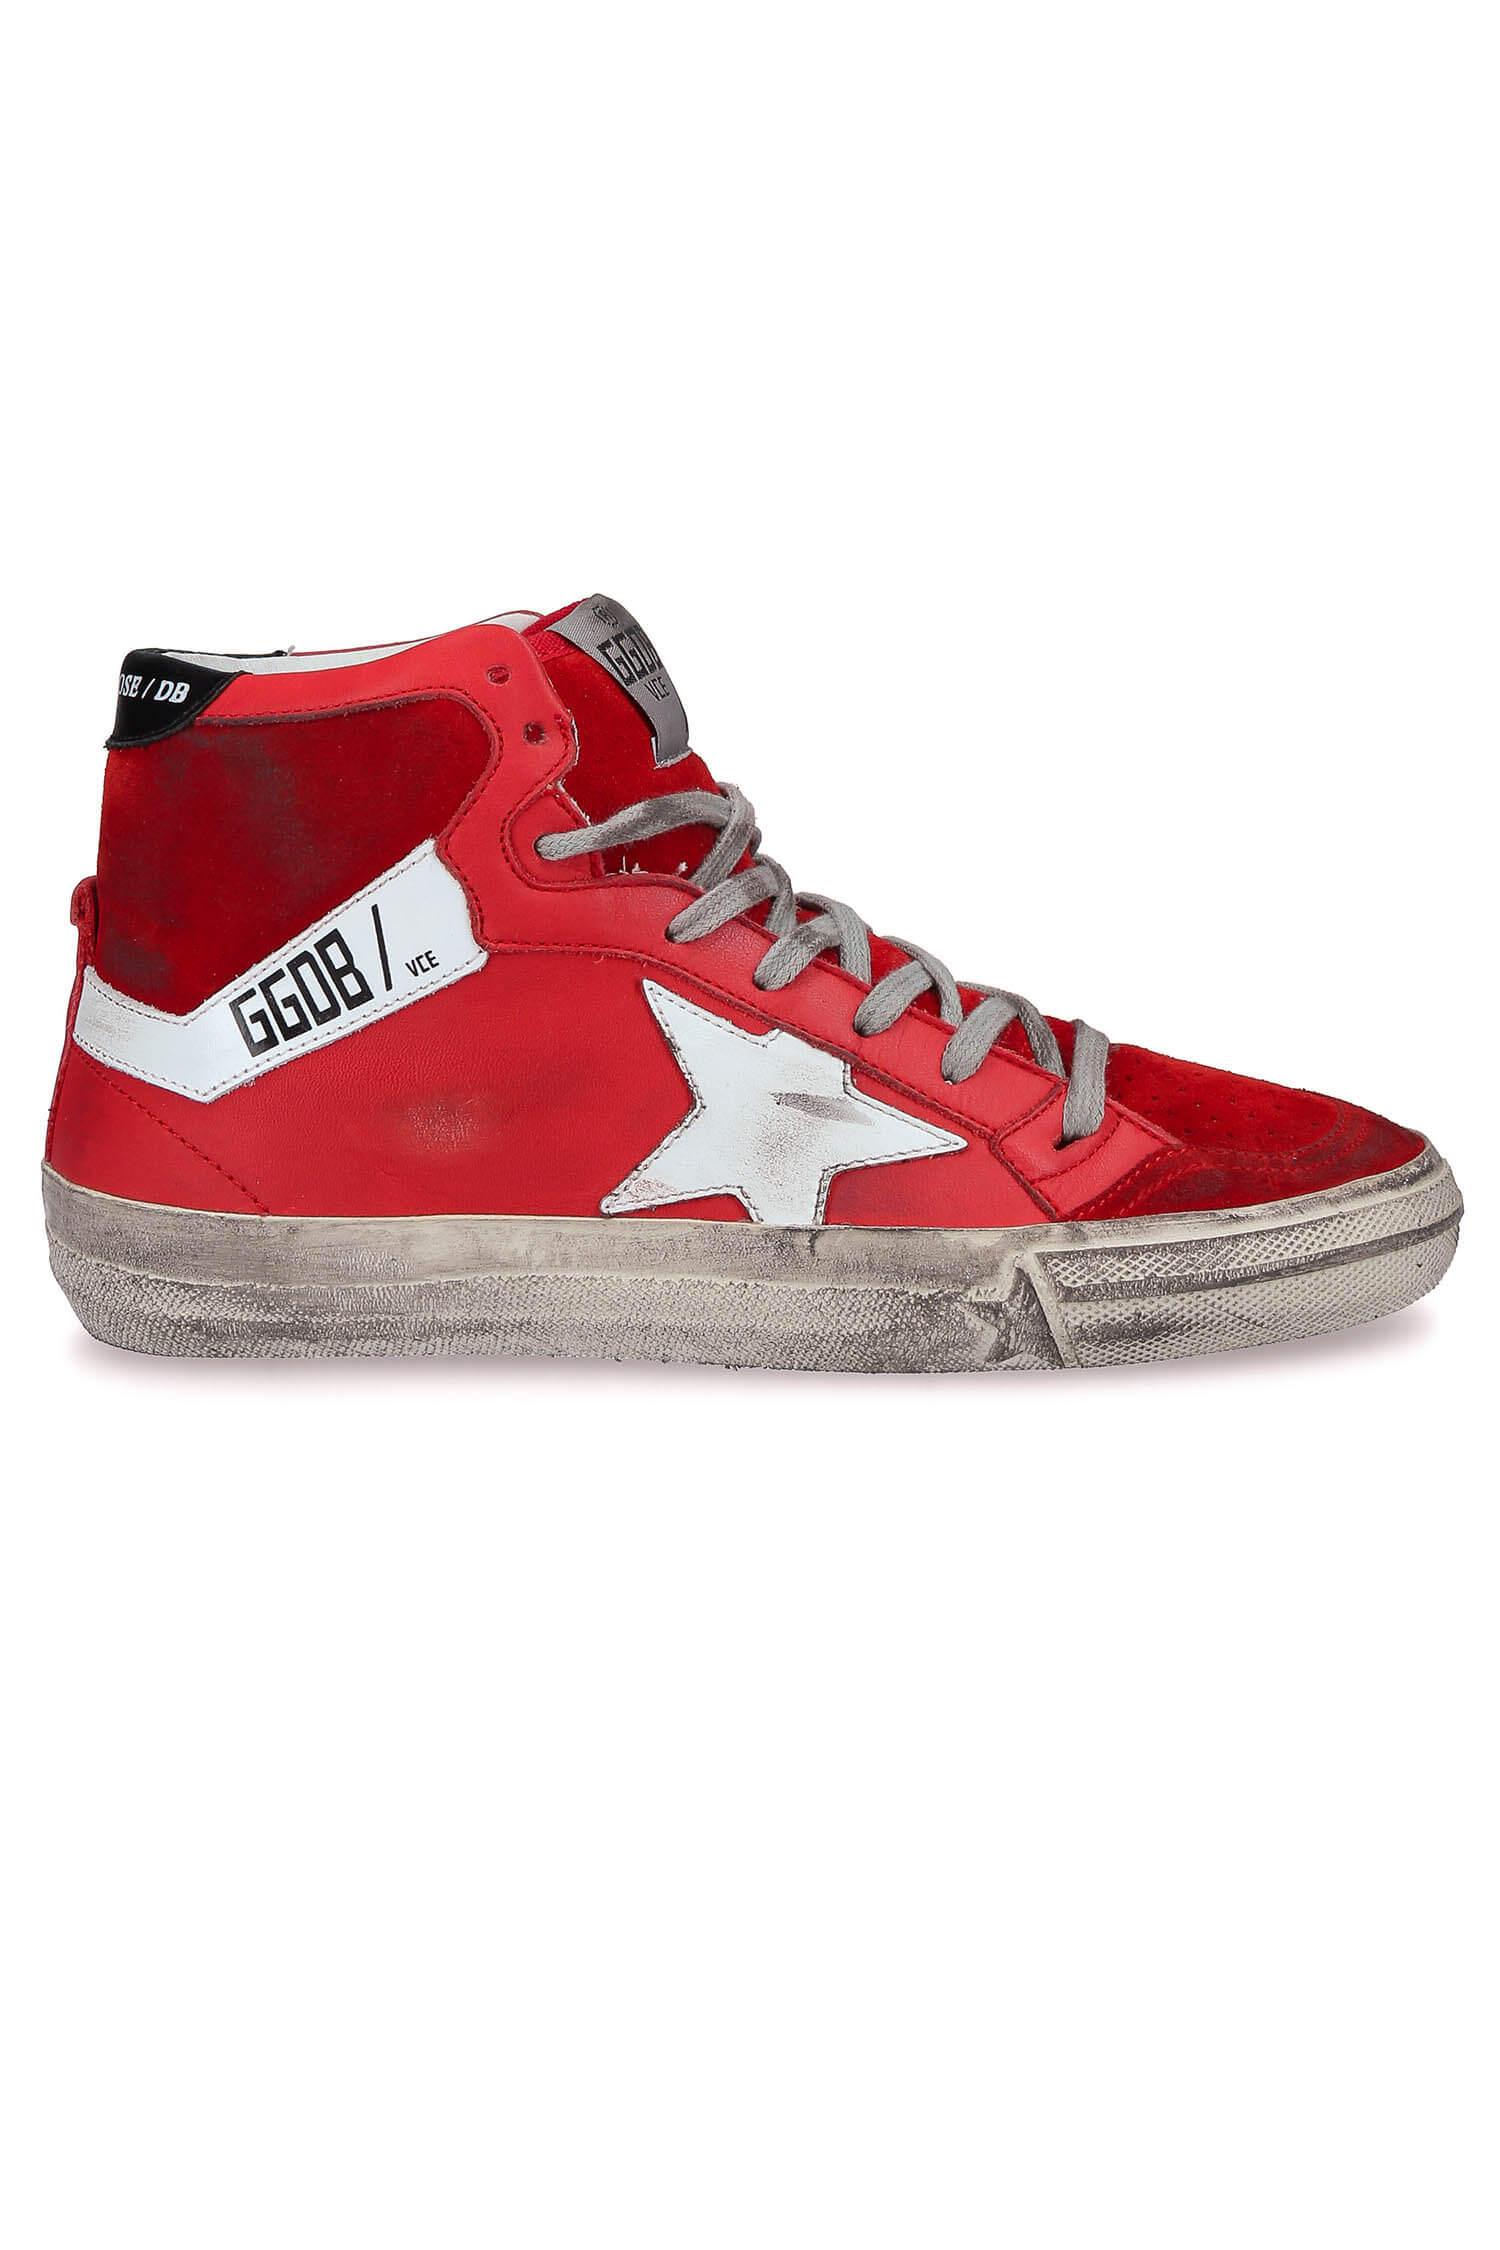 Sneakers Slide Cyclamin Glitter White StarGolden Goose uaDocucb